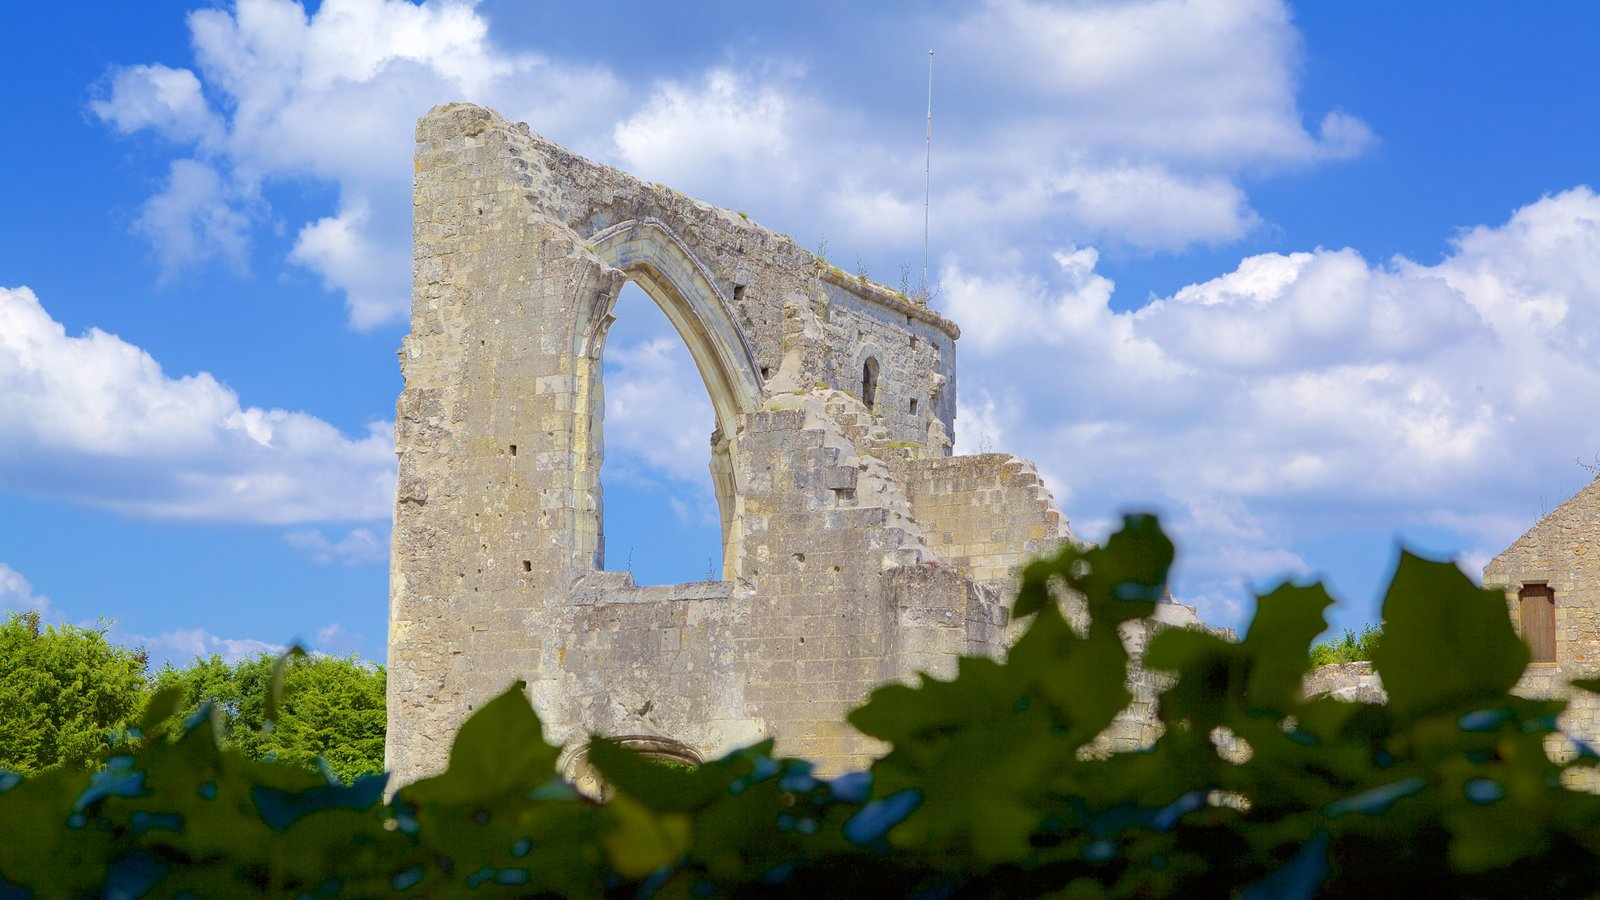 Prieure de St-Cosme caracterizando ruínas de edifício e elementos de patrimônio